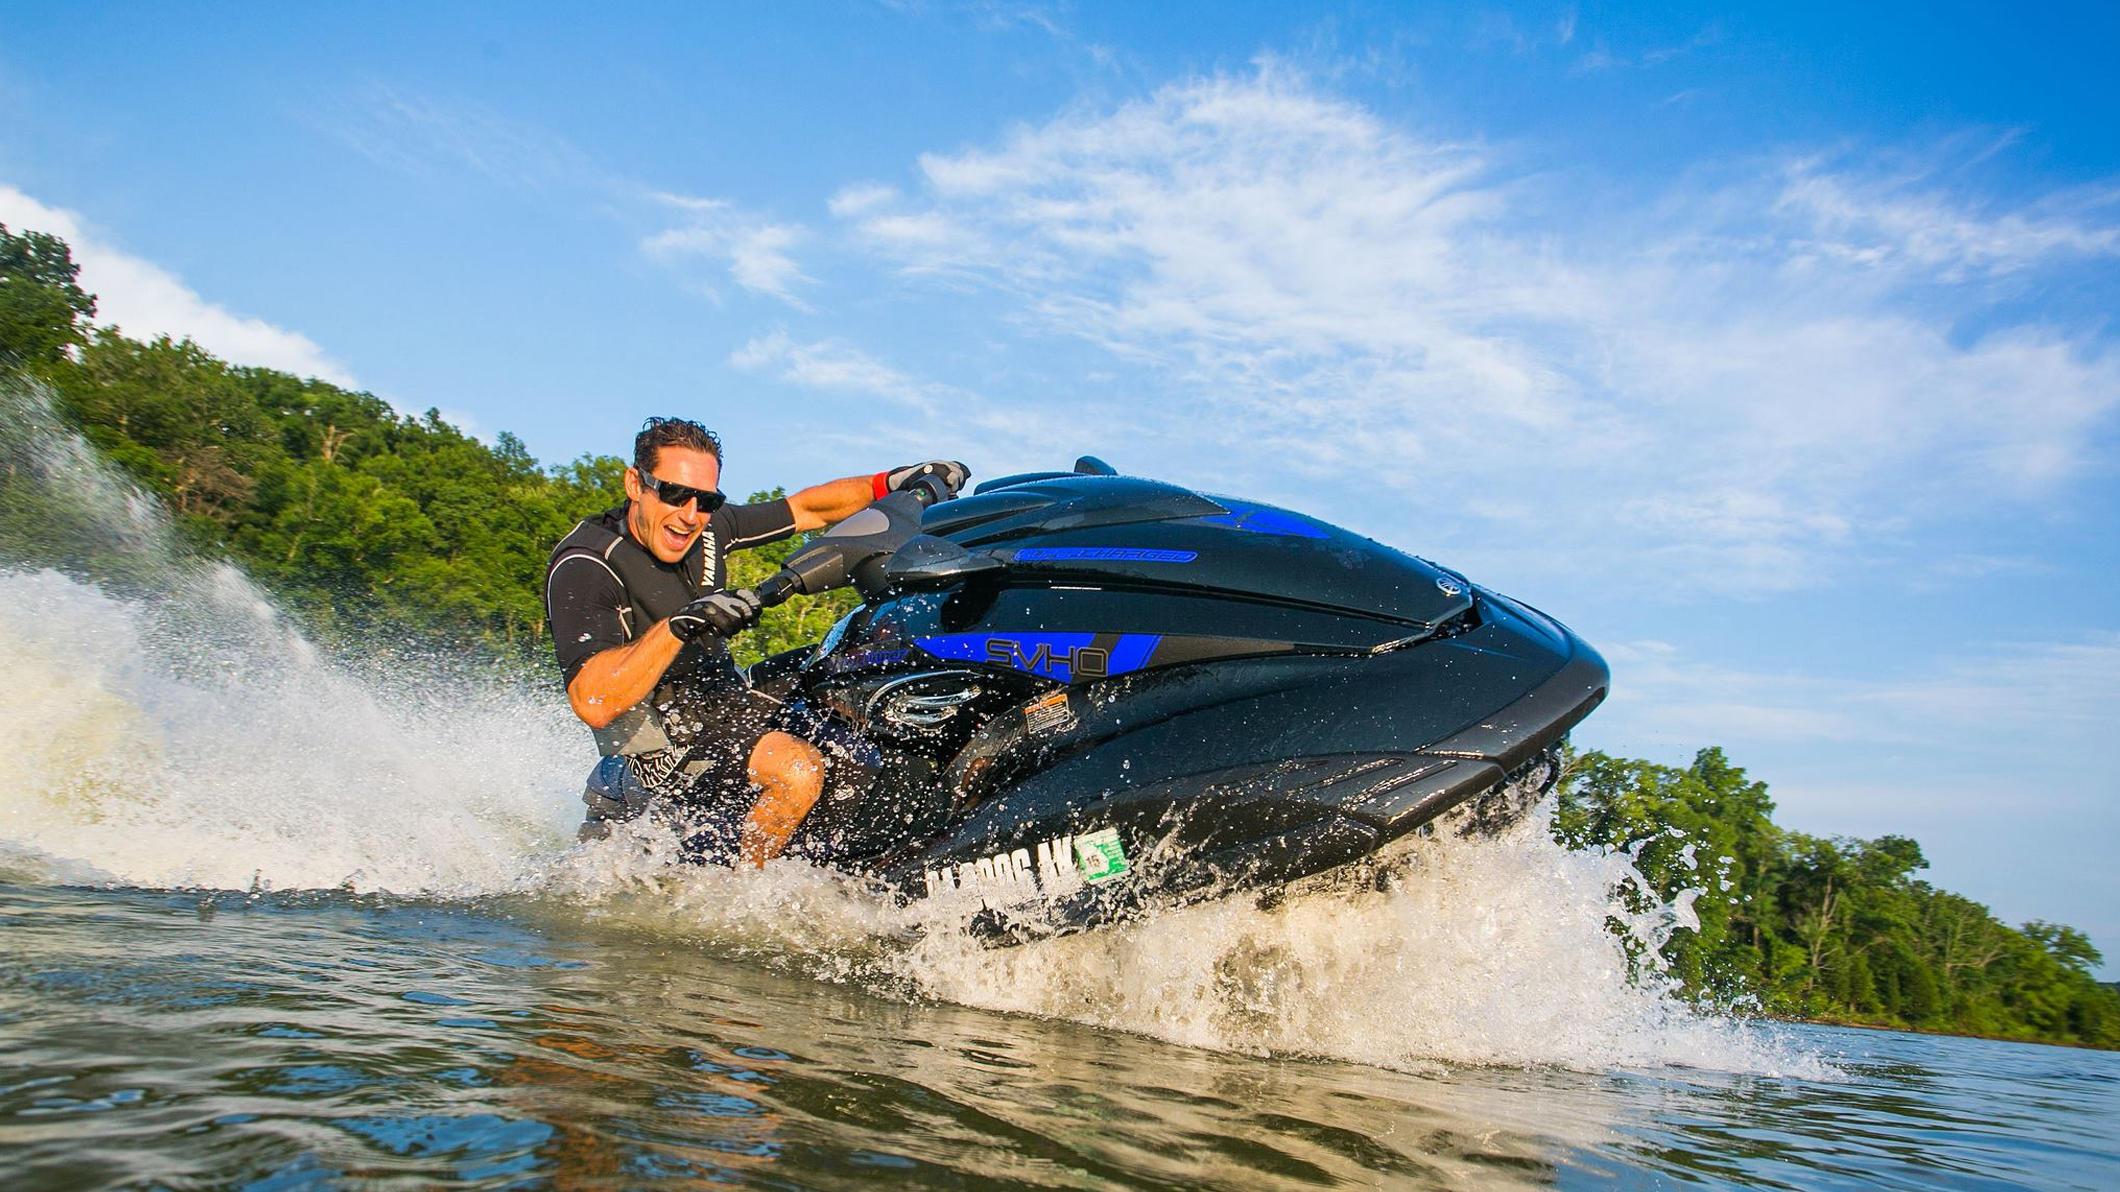 Extreme Sports Yamaha Polaris Sumter Sc